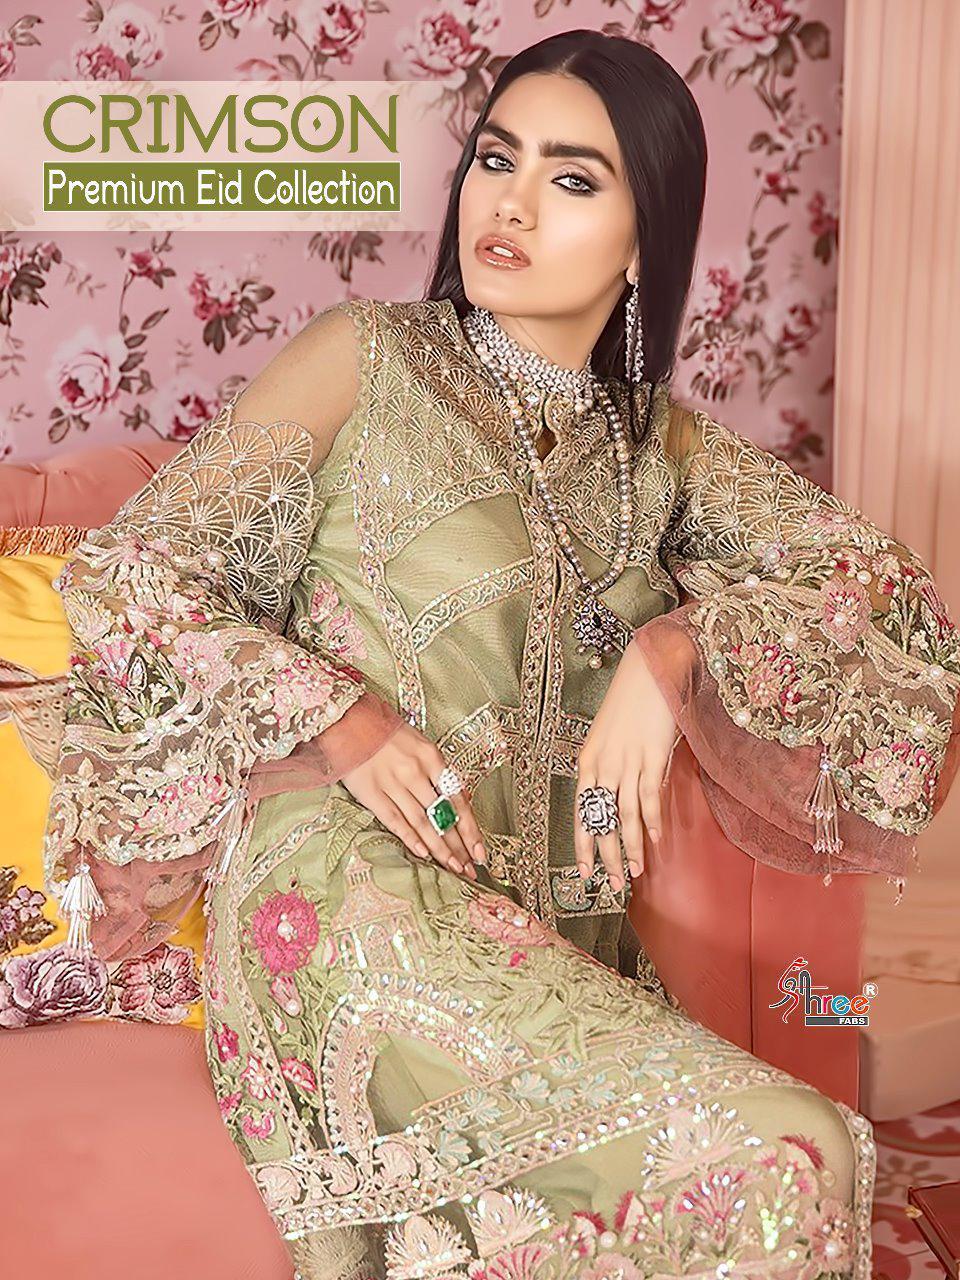 Shree Fab Crimson Premium Eid Collection Best Wholesale Rate